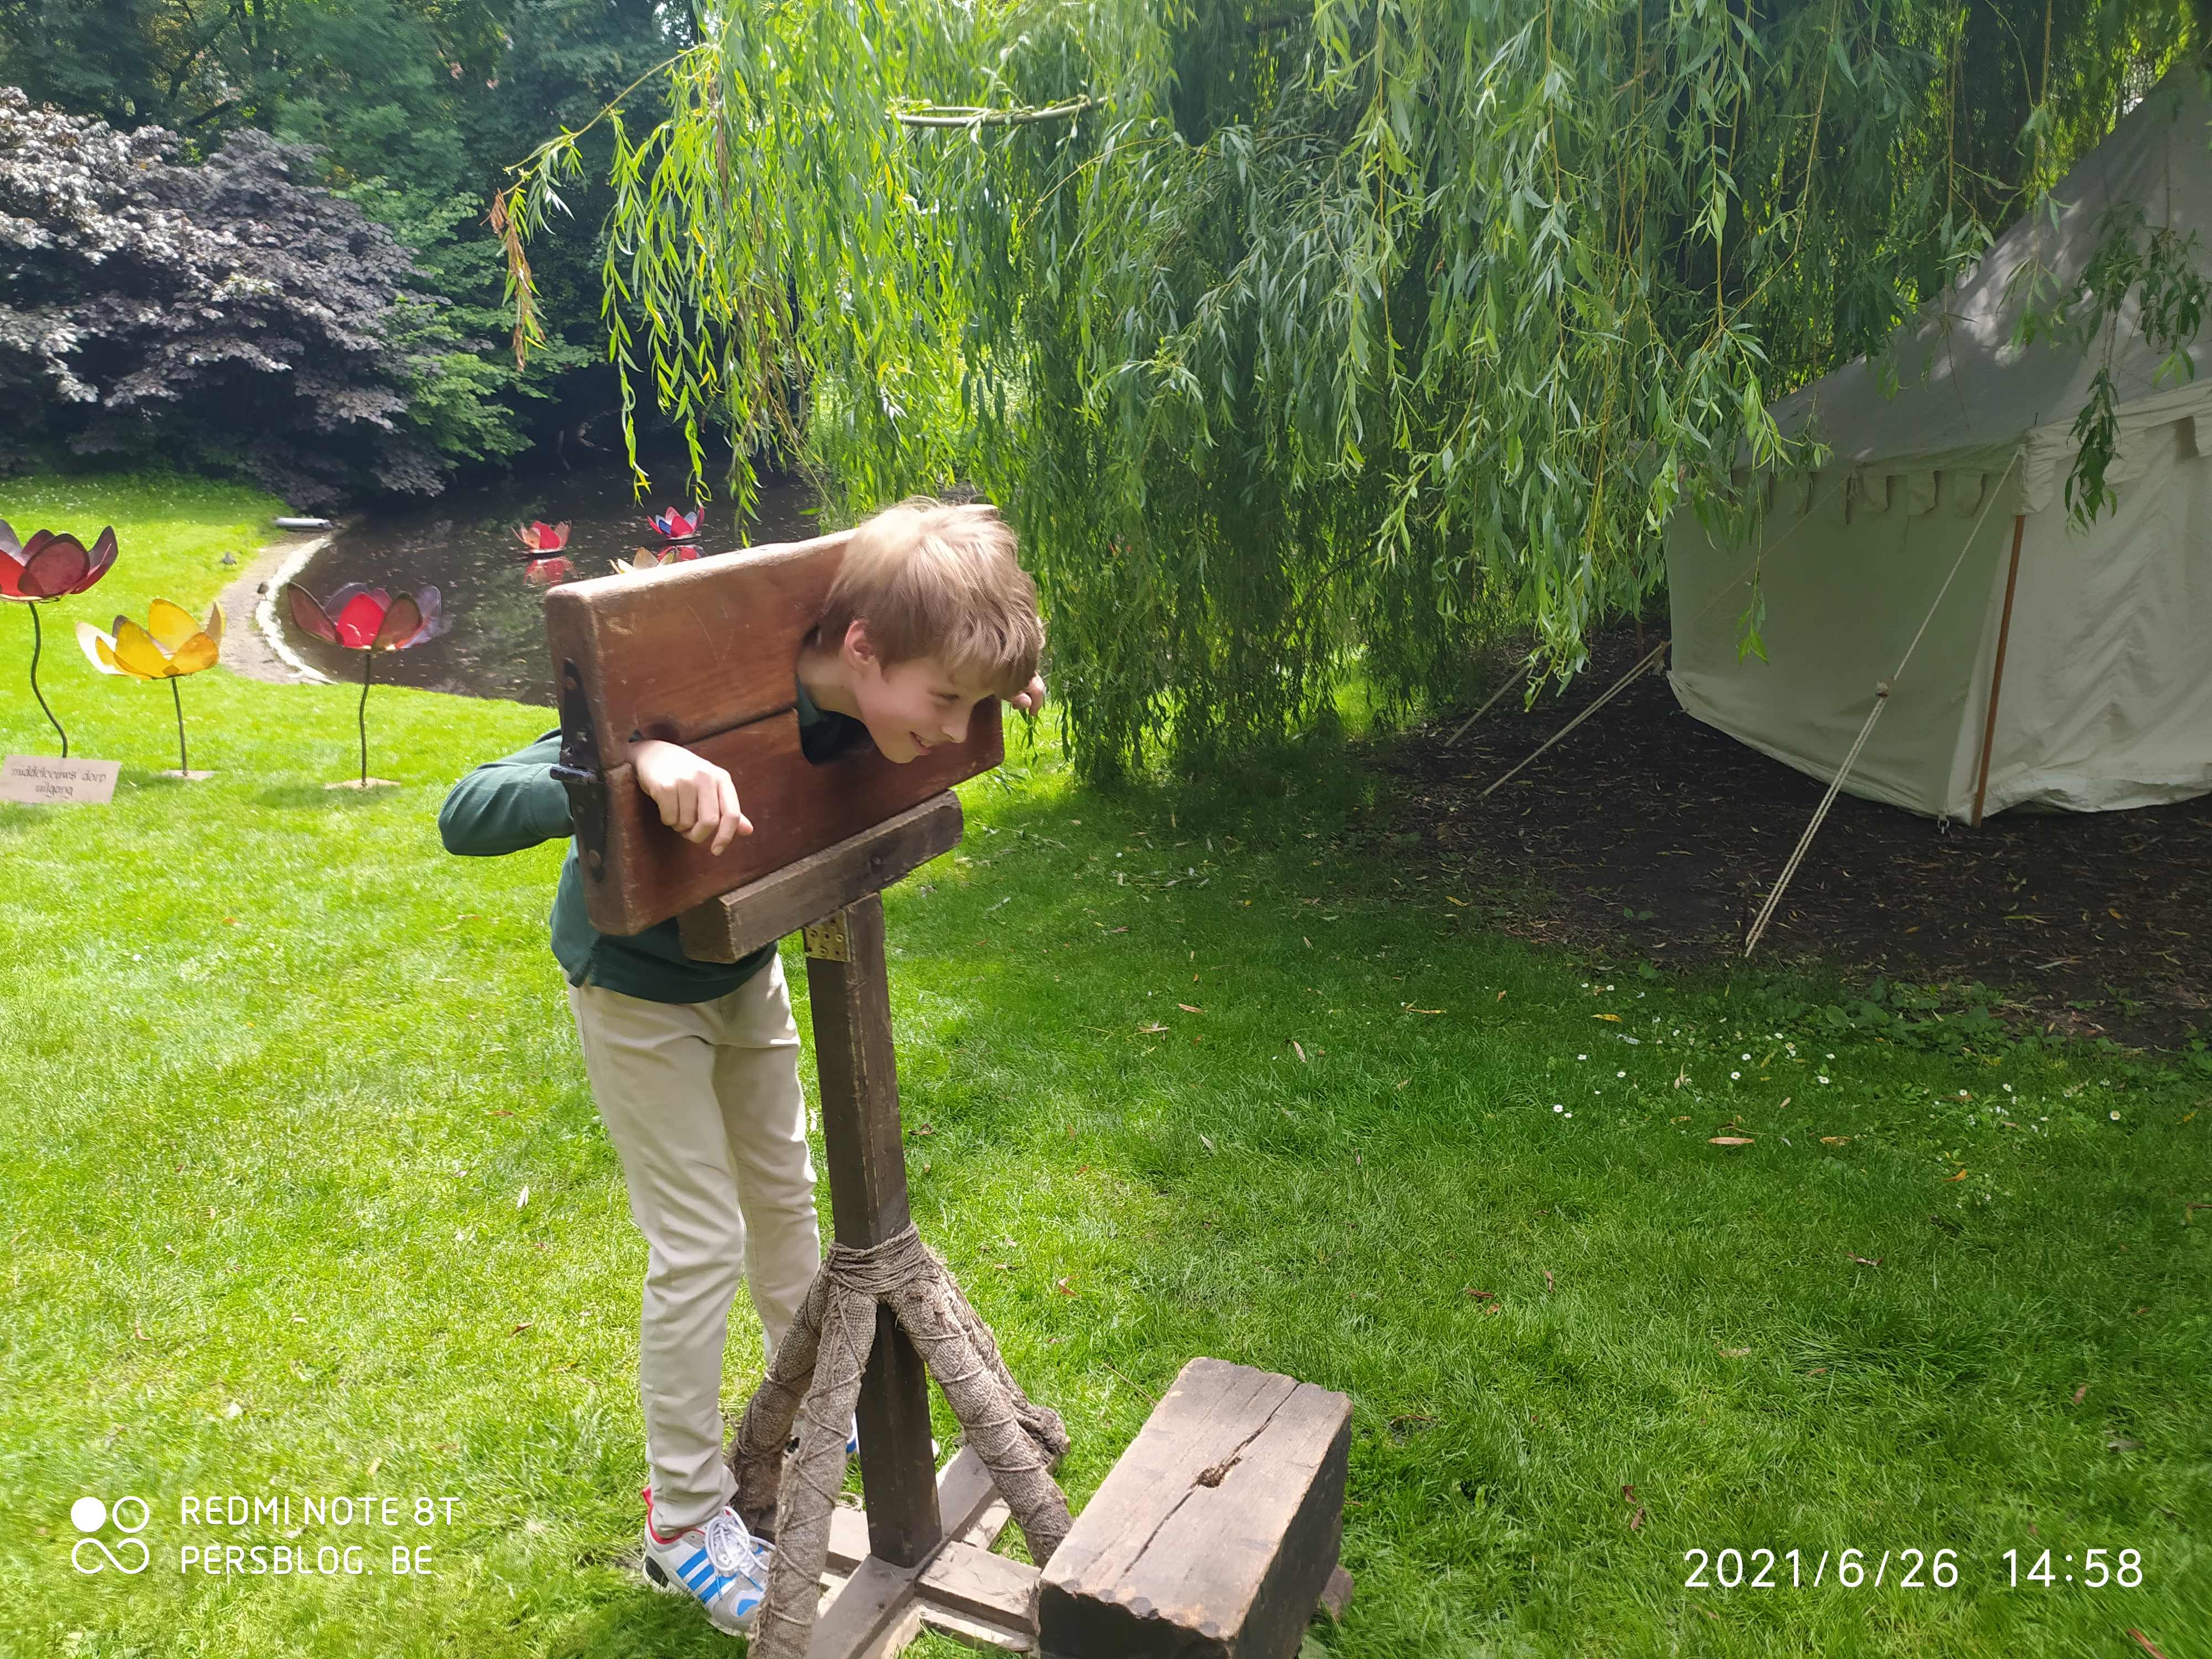 c Ferdinand Lousbergkaai - Ossenstraat - Koningin Astridpark - Middeleeuws spektakel IMG_20210626_145915 (2)